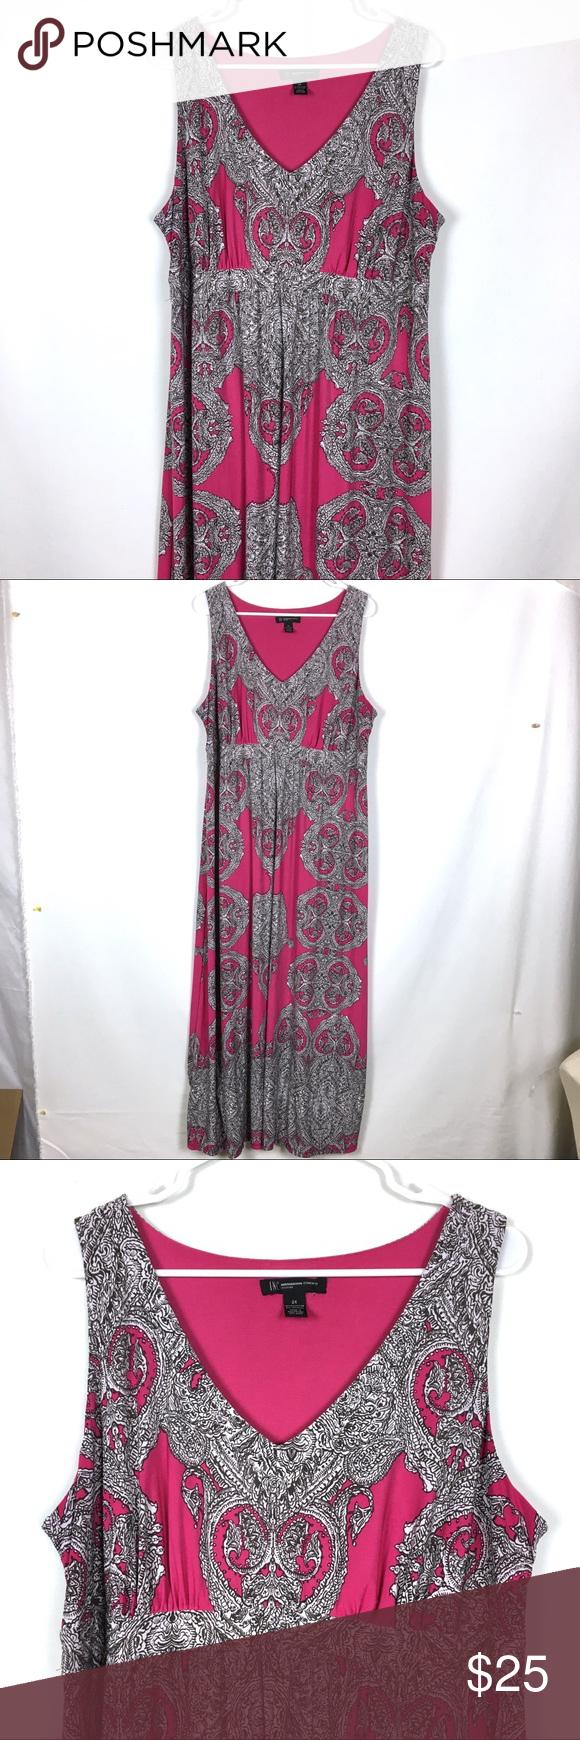 Inc Maxi Dress Sleeveless Pink Black 2x Maxi Dress Long Summer Dresses Maxi Long Maxi Dress [ 1740 x 580 Pixel ]